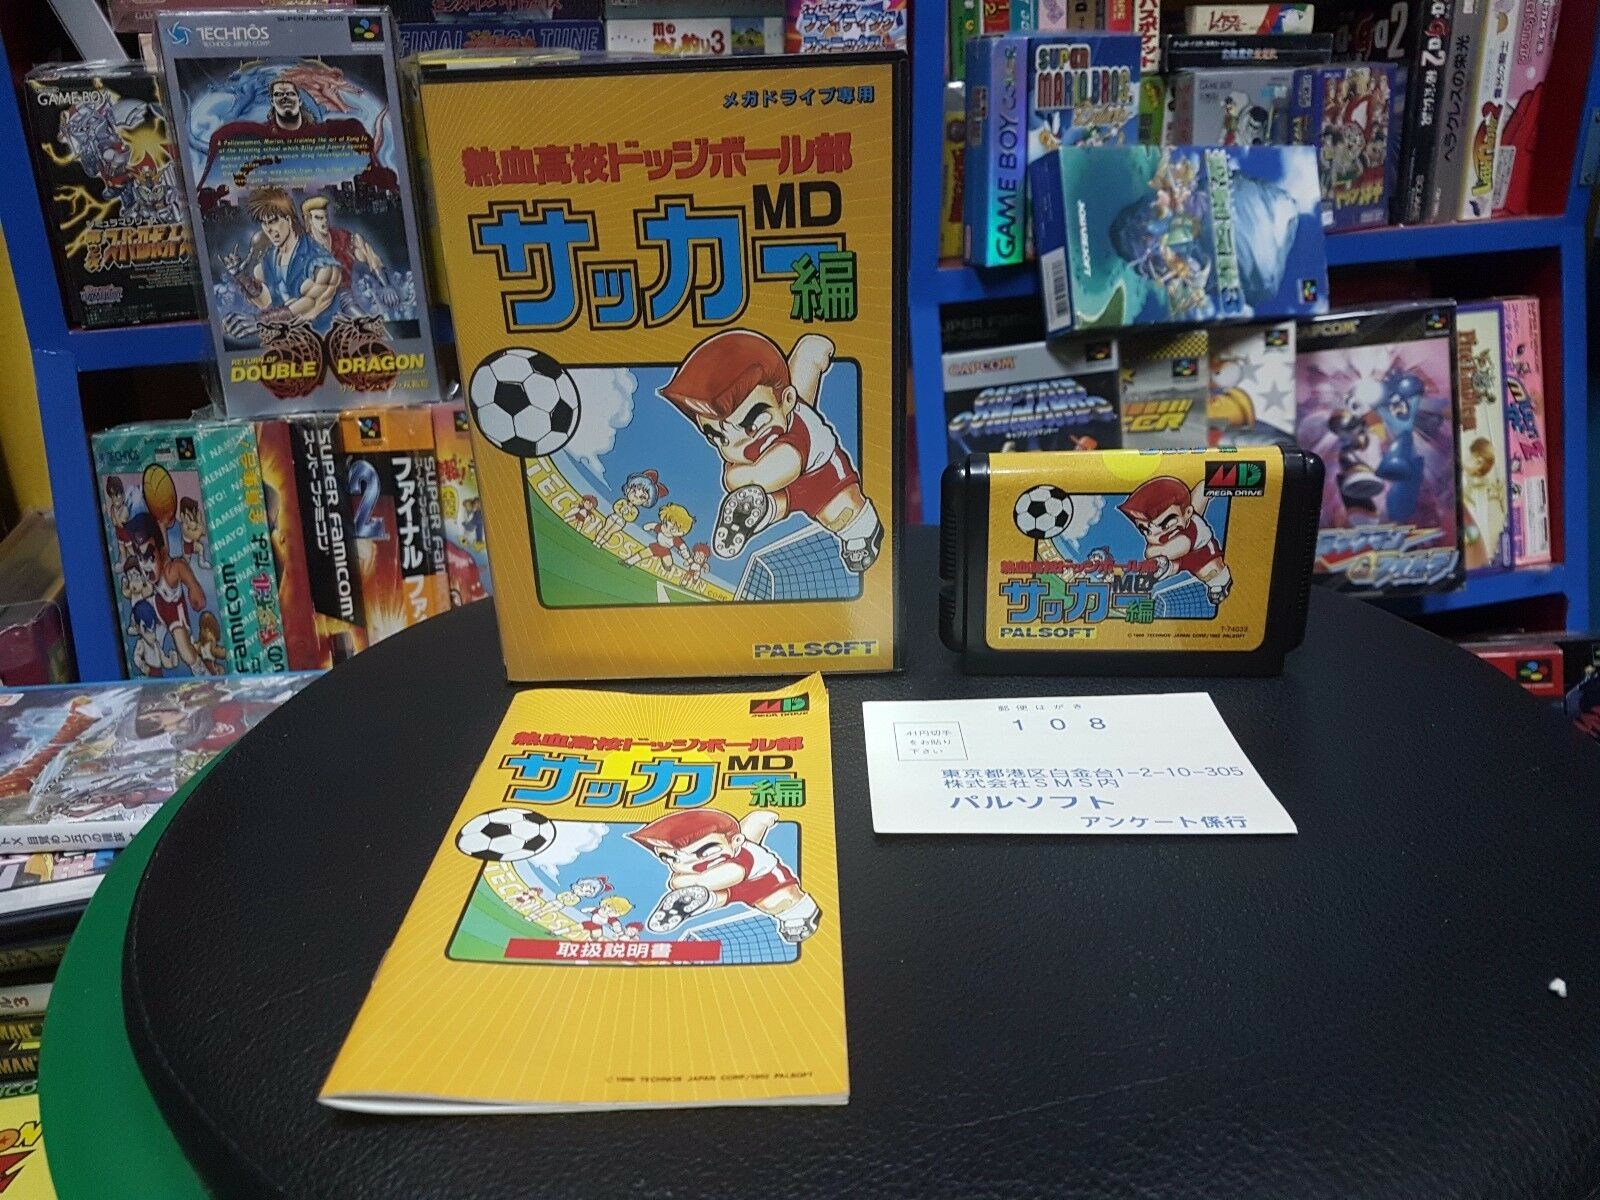 Nekketsu Koukou Dodgeboll Soccer Kunio Mega Drive Genesis MD japan Komplett @2